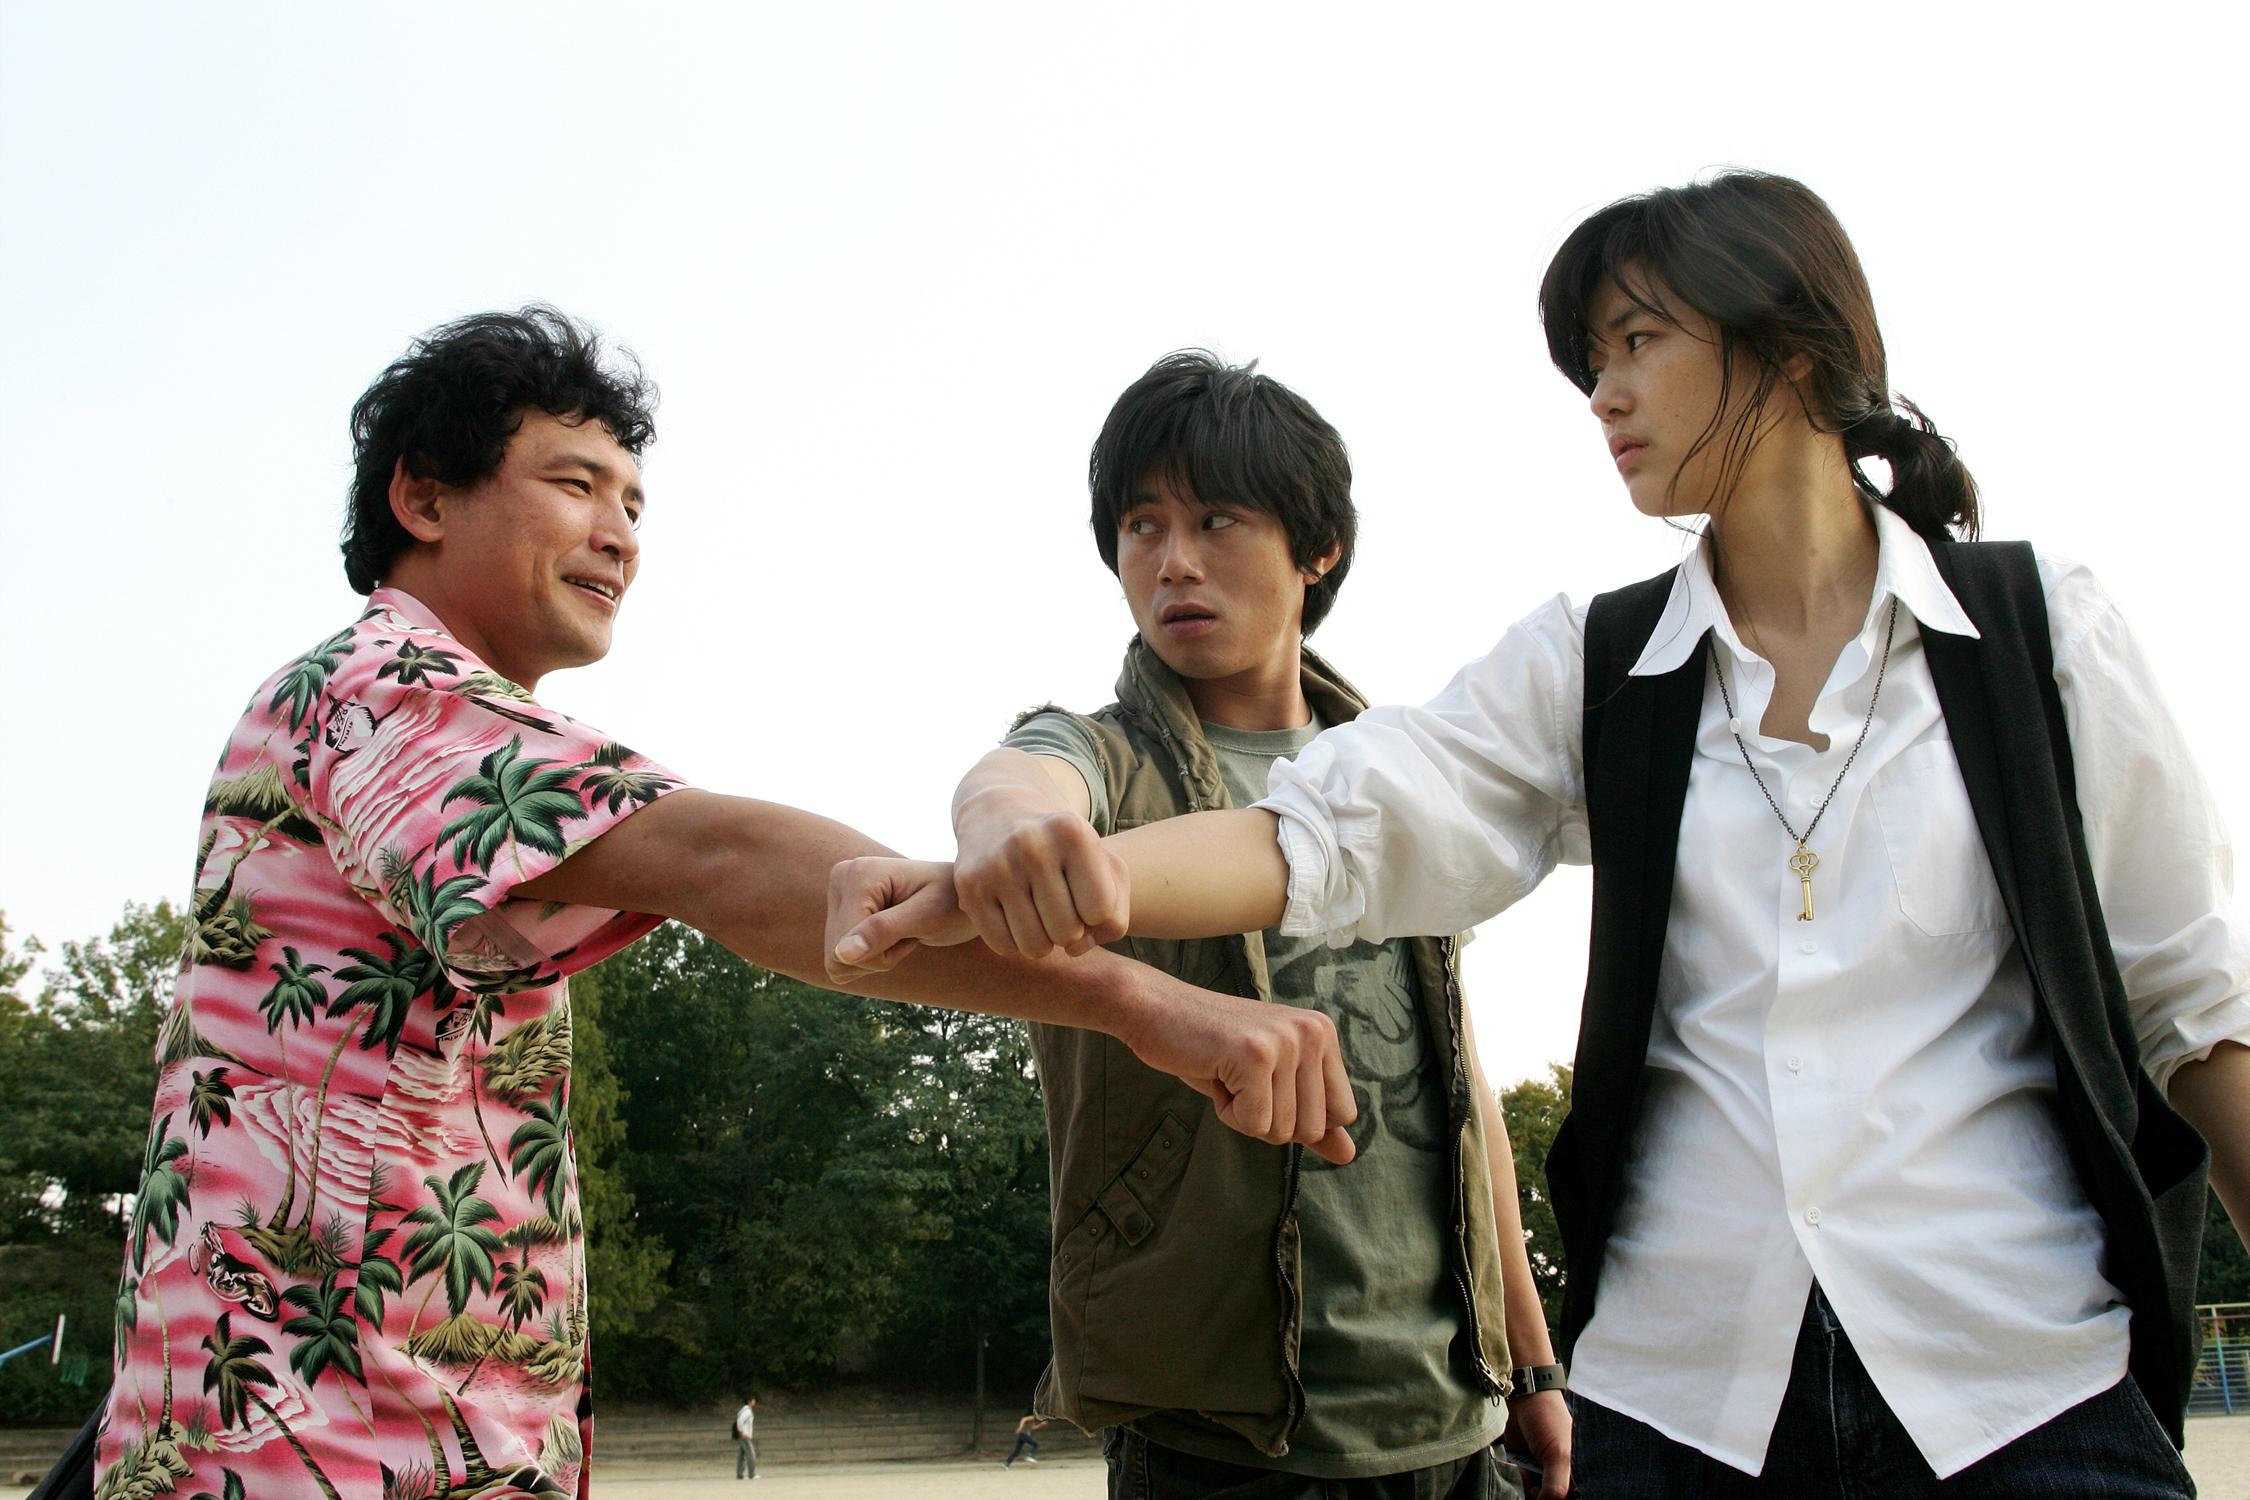 Syoo-peo-maen-i-sseo-deon sa-na-i (2008)